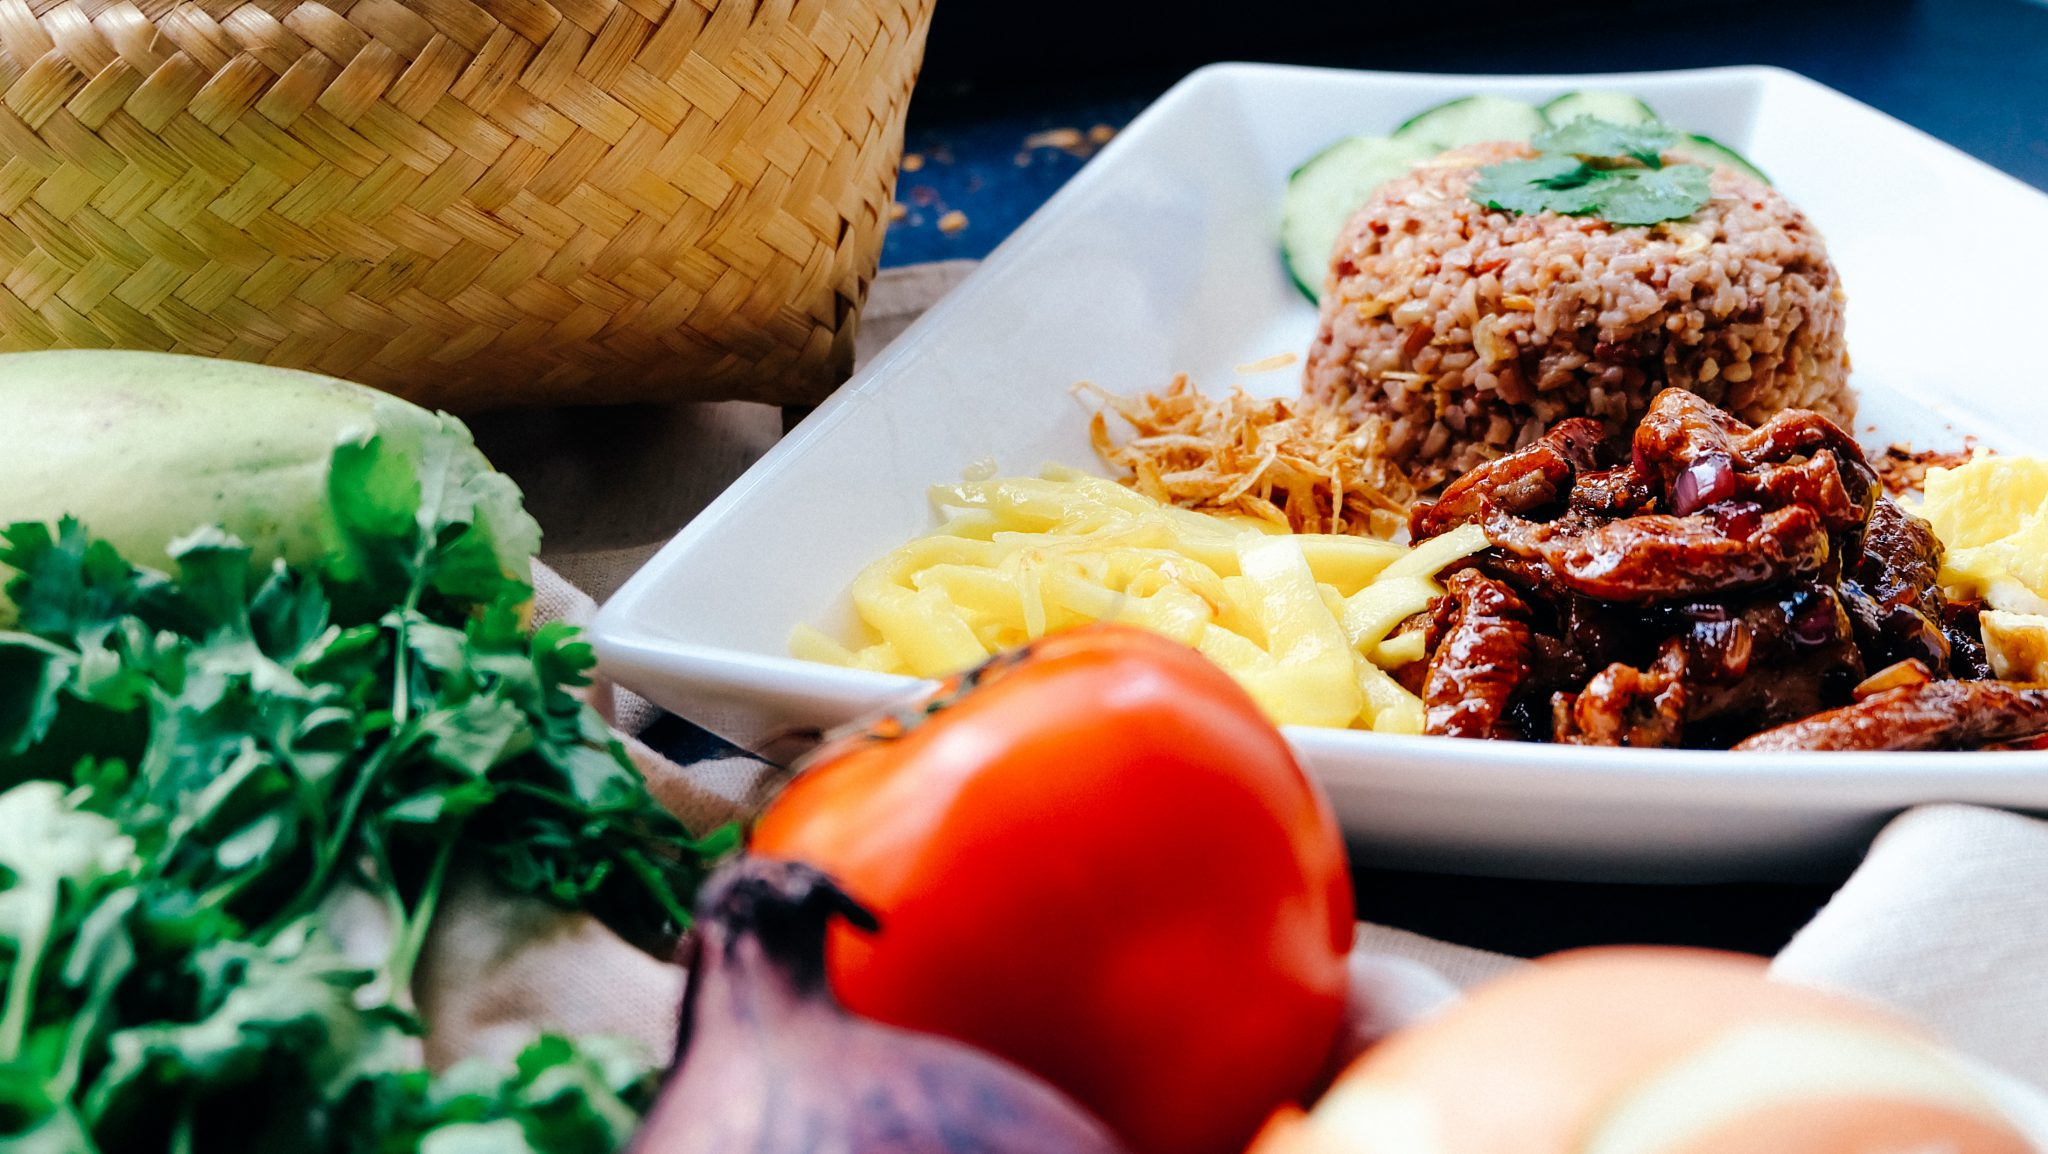 Plato restaurante vegetariano